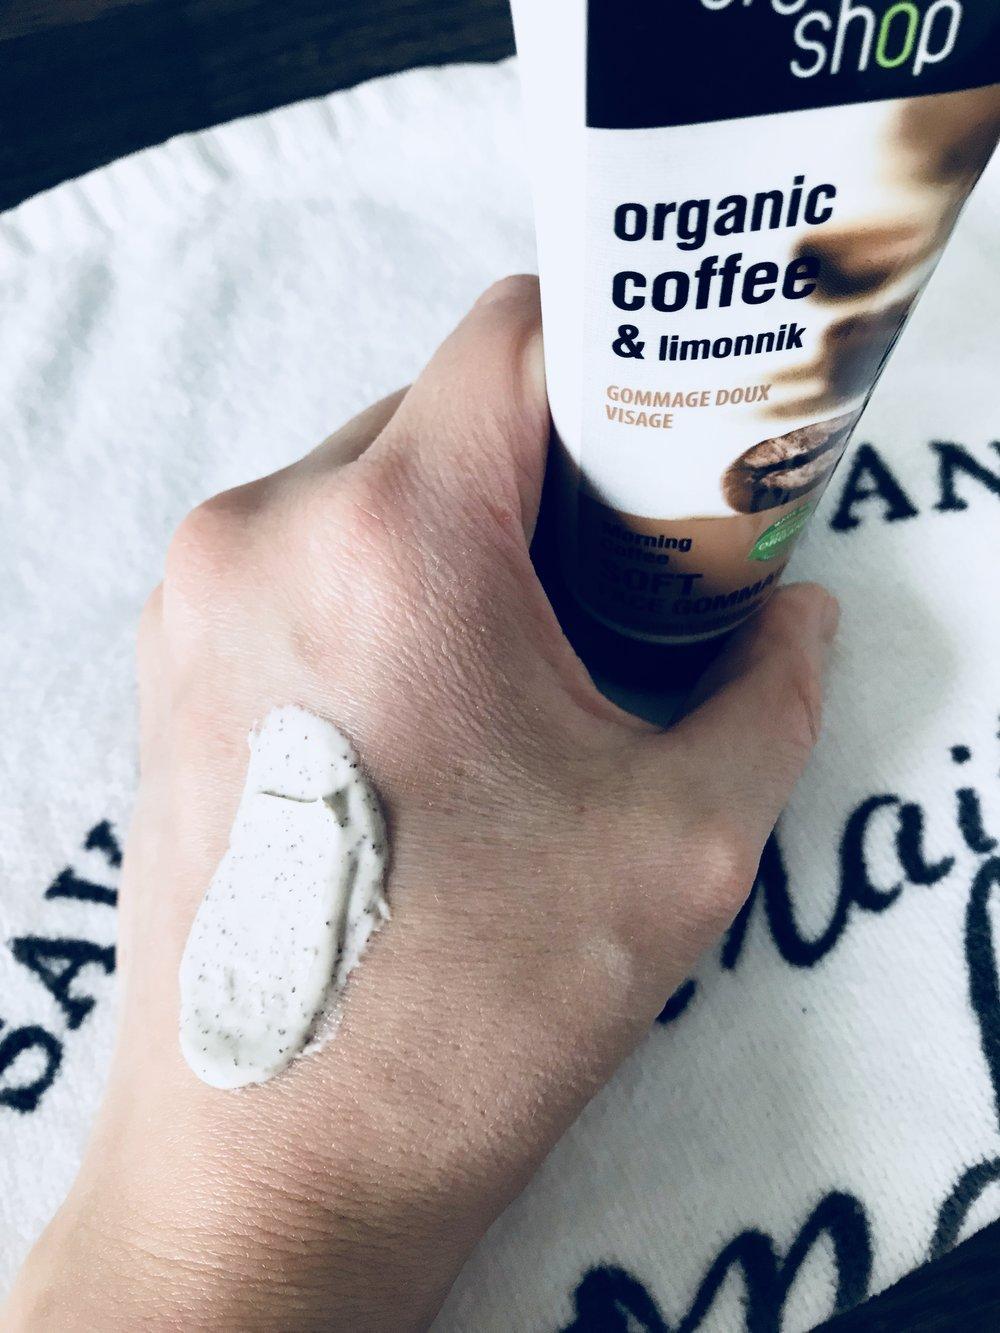 Organic Shop face peeling